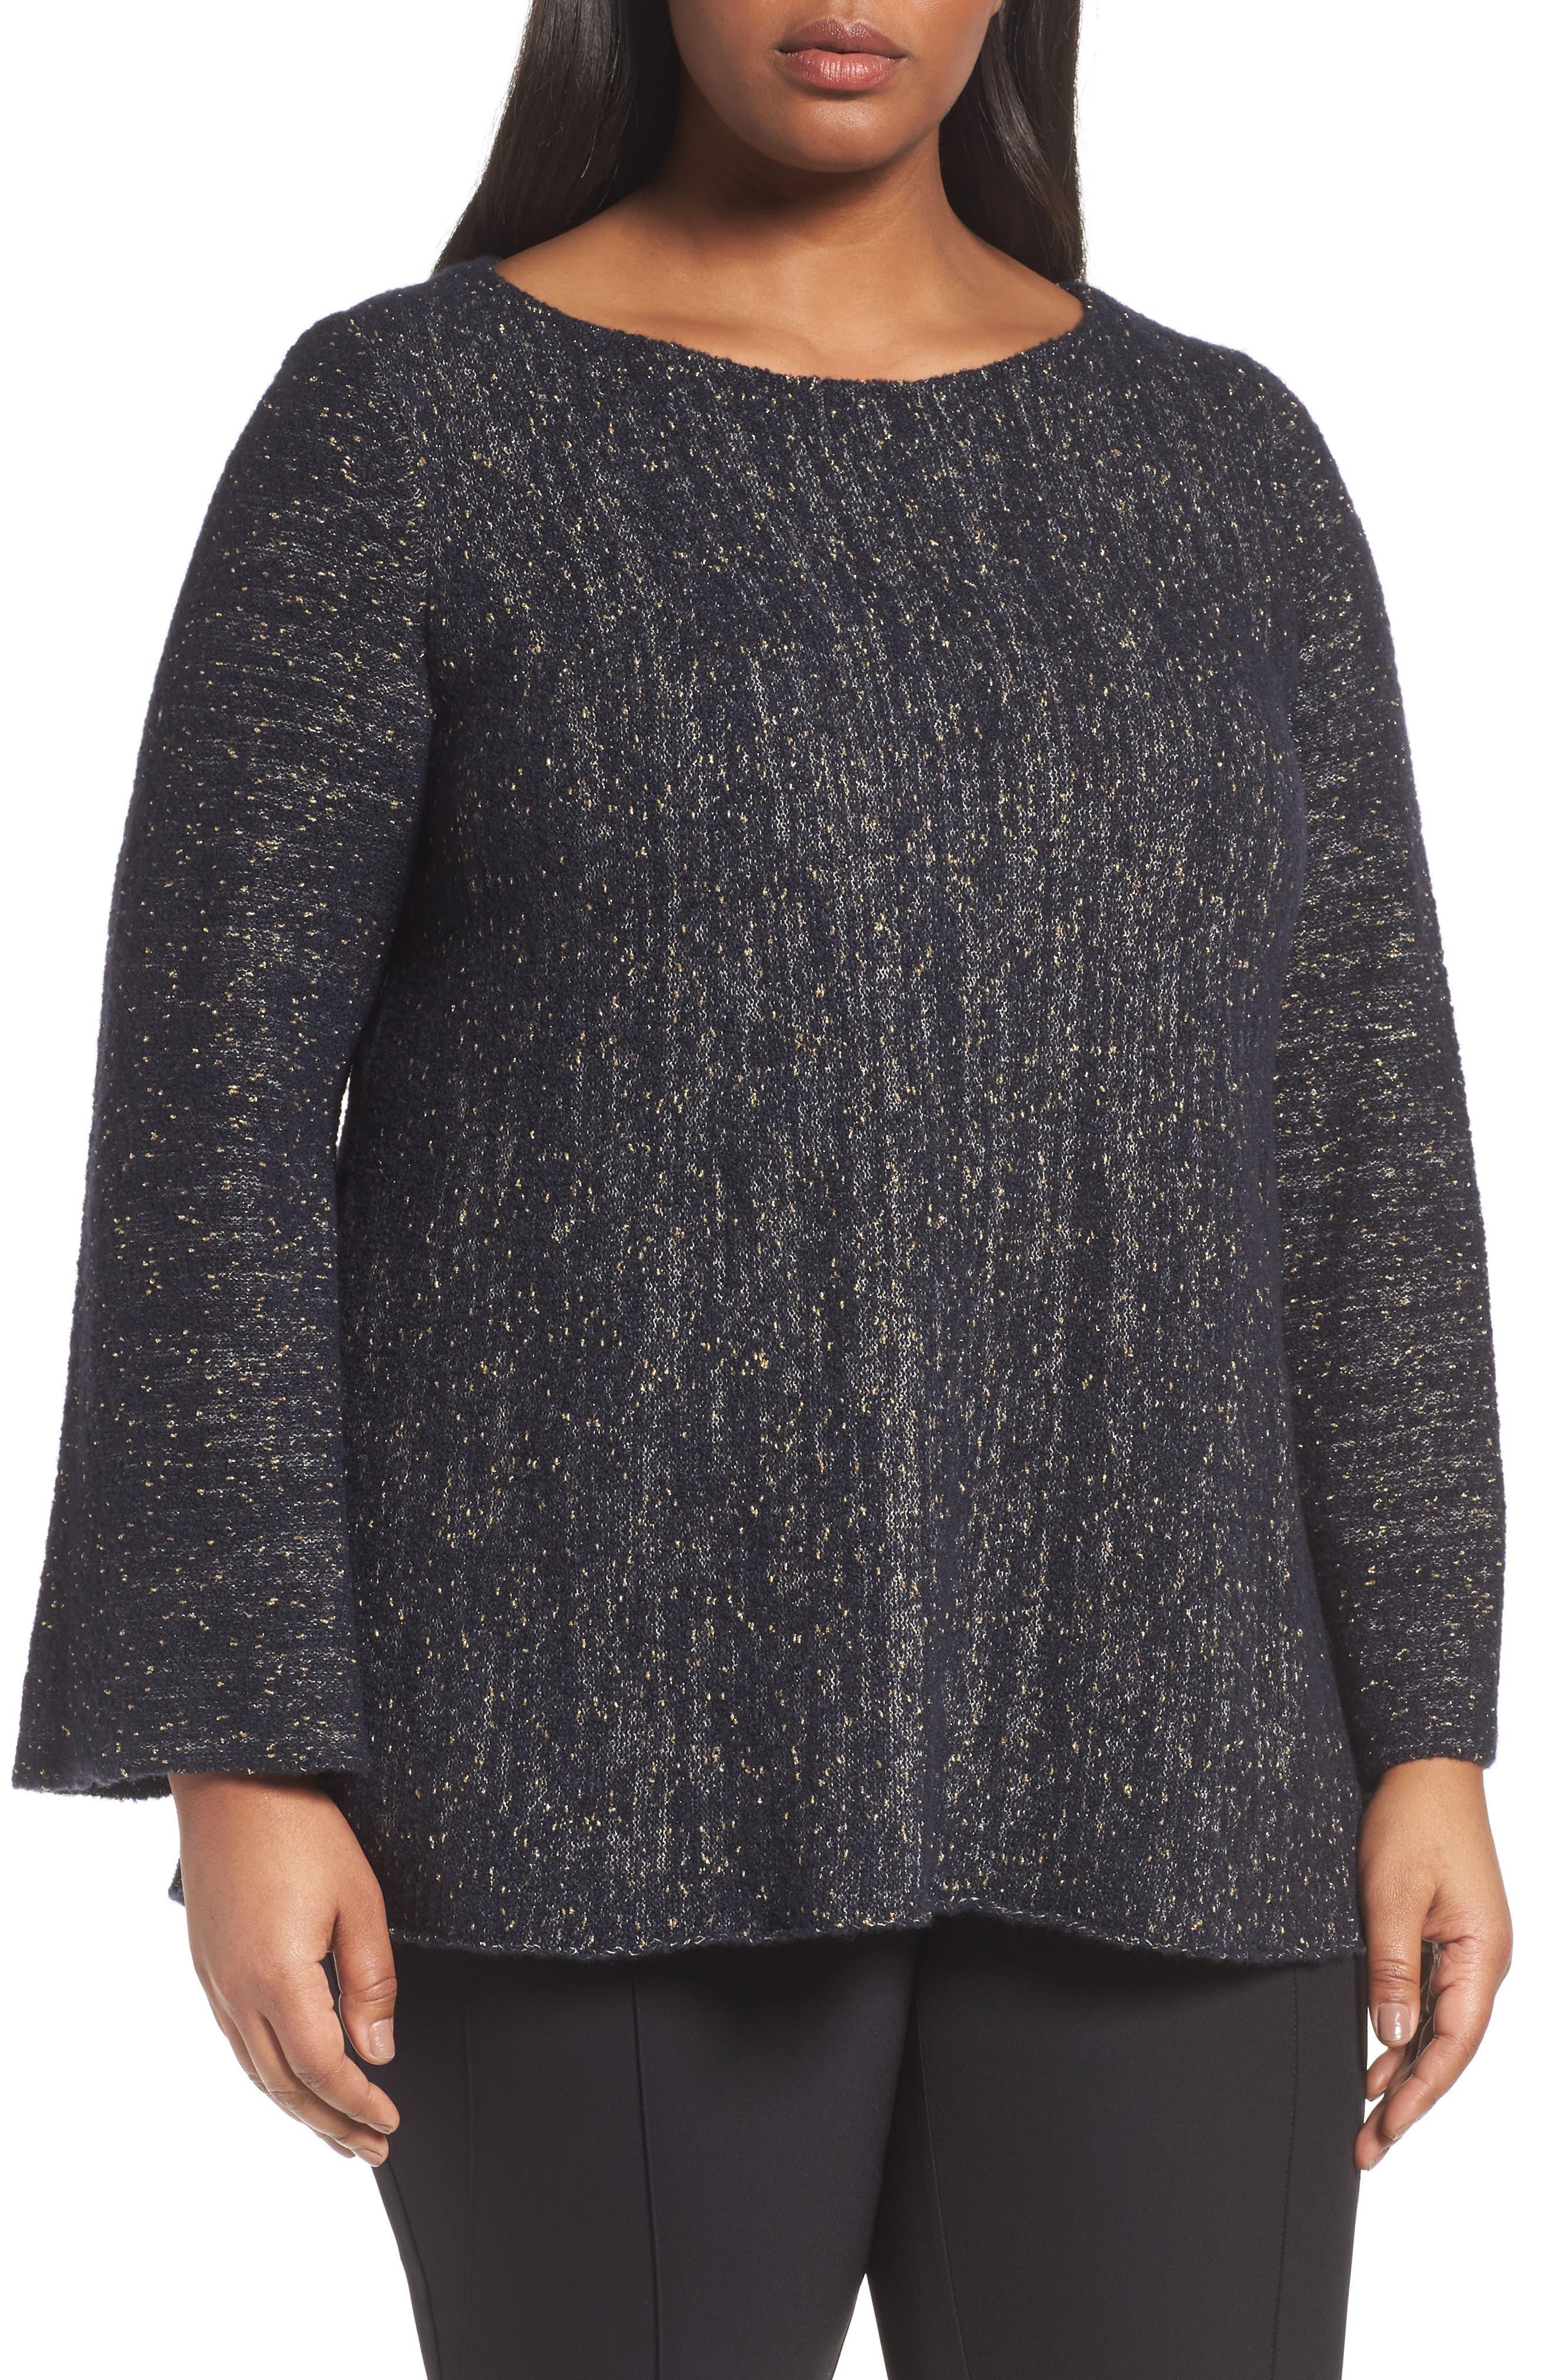 Lafayette 148 Metallic Knit A-Line Sweater,                             Main thumbnail 1, color,                             479